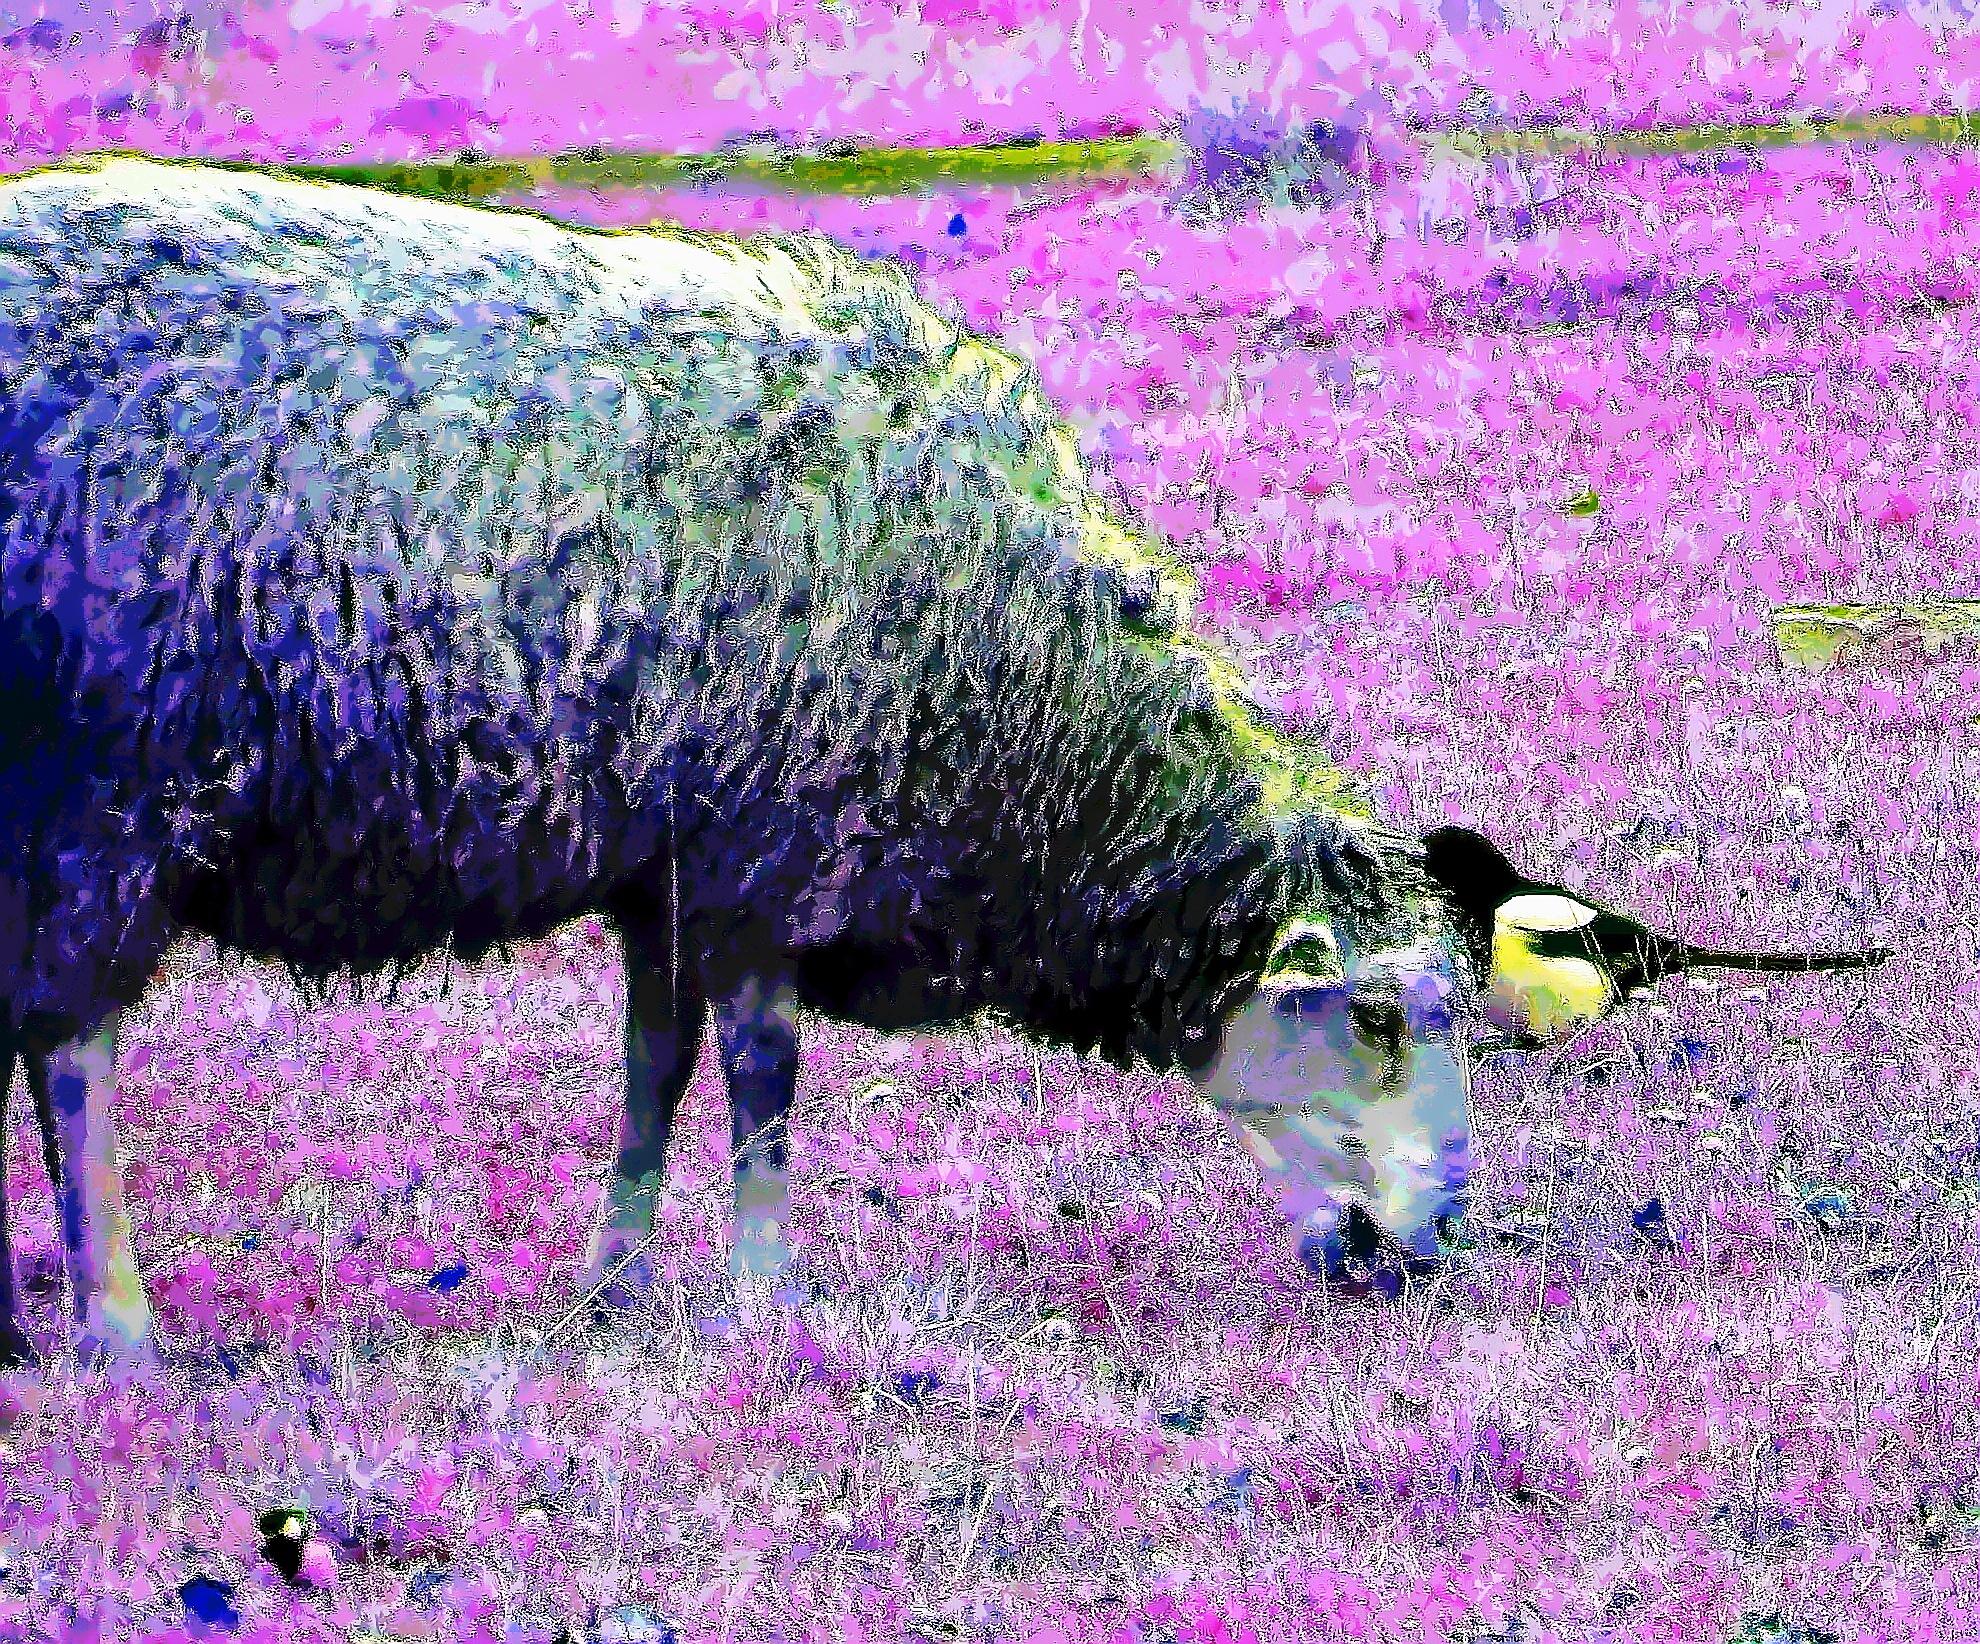 Sheep and Birds by sergey.parfeniuk